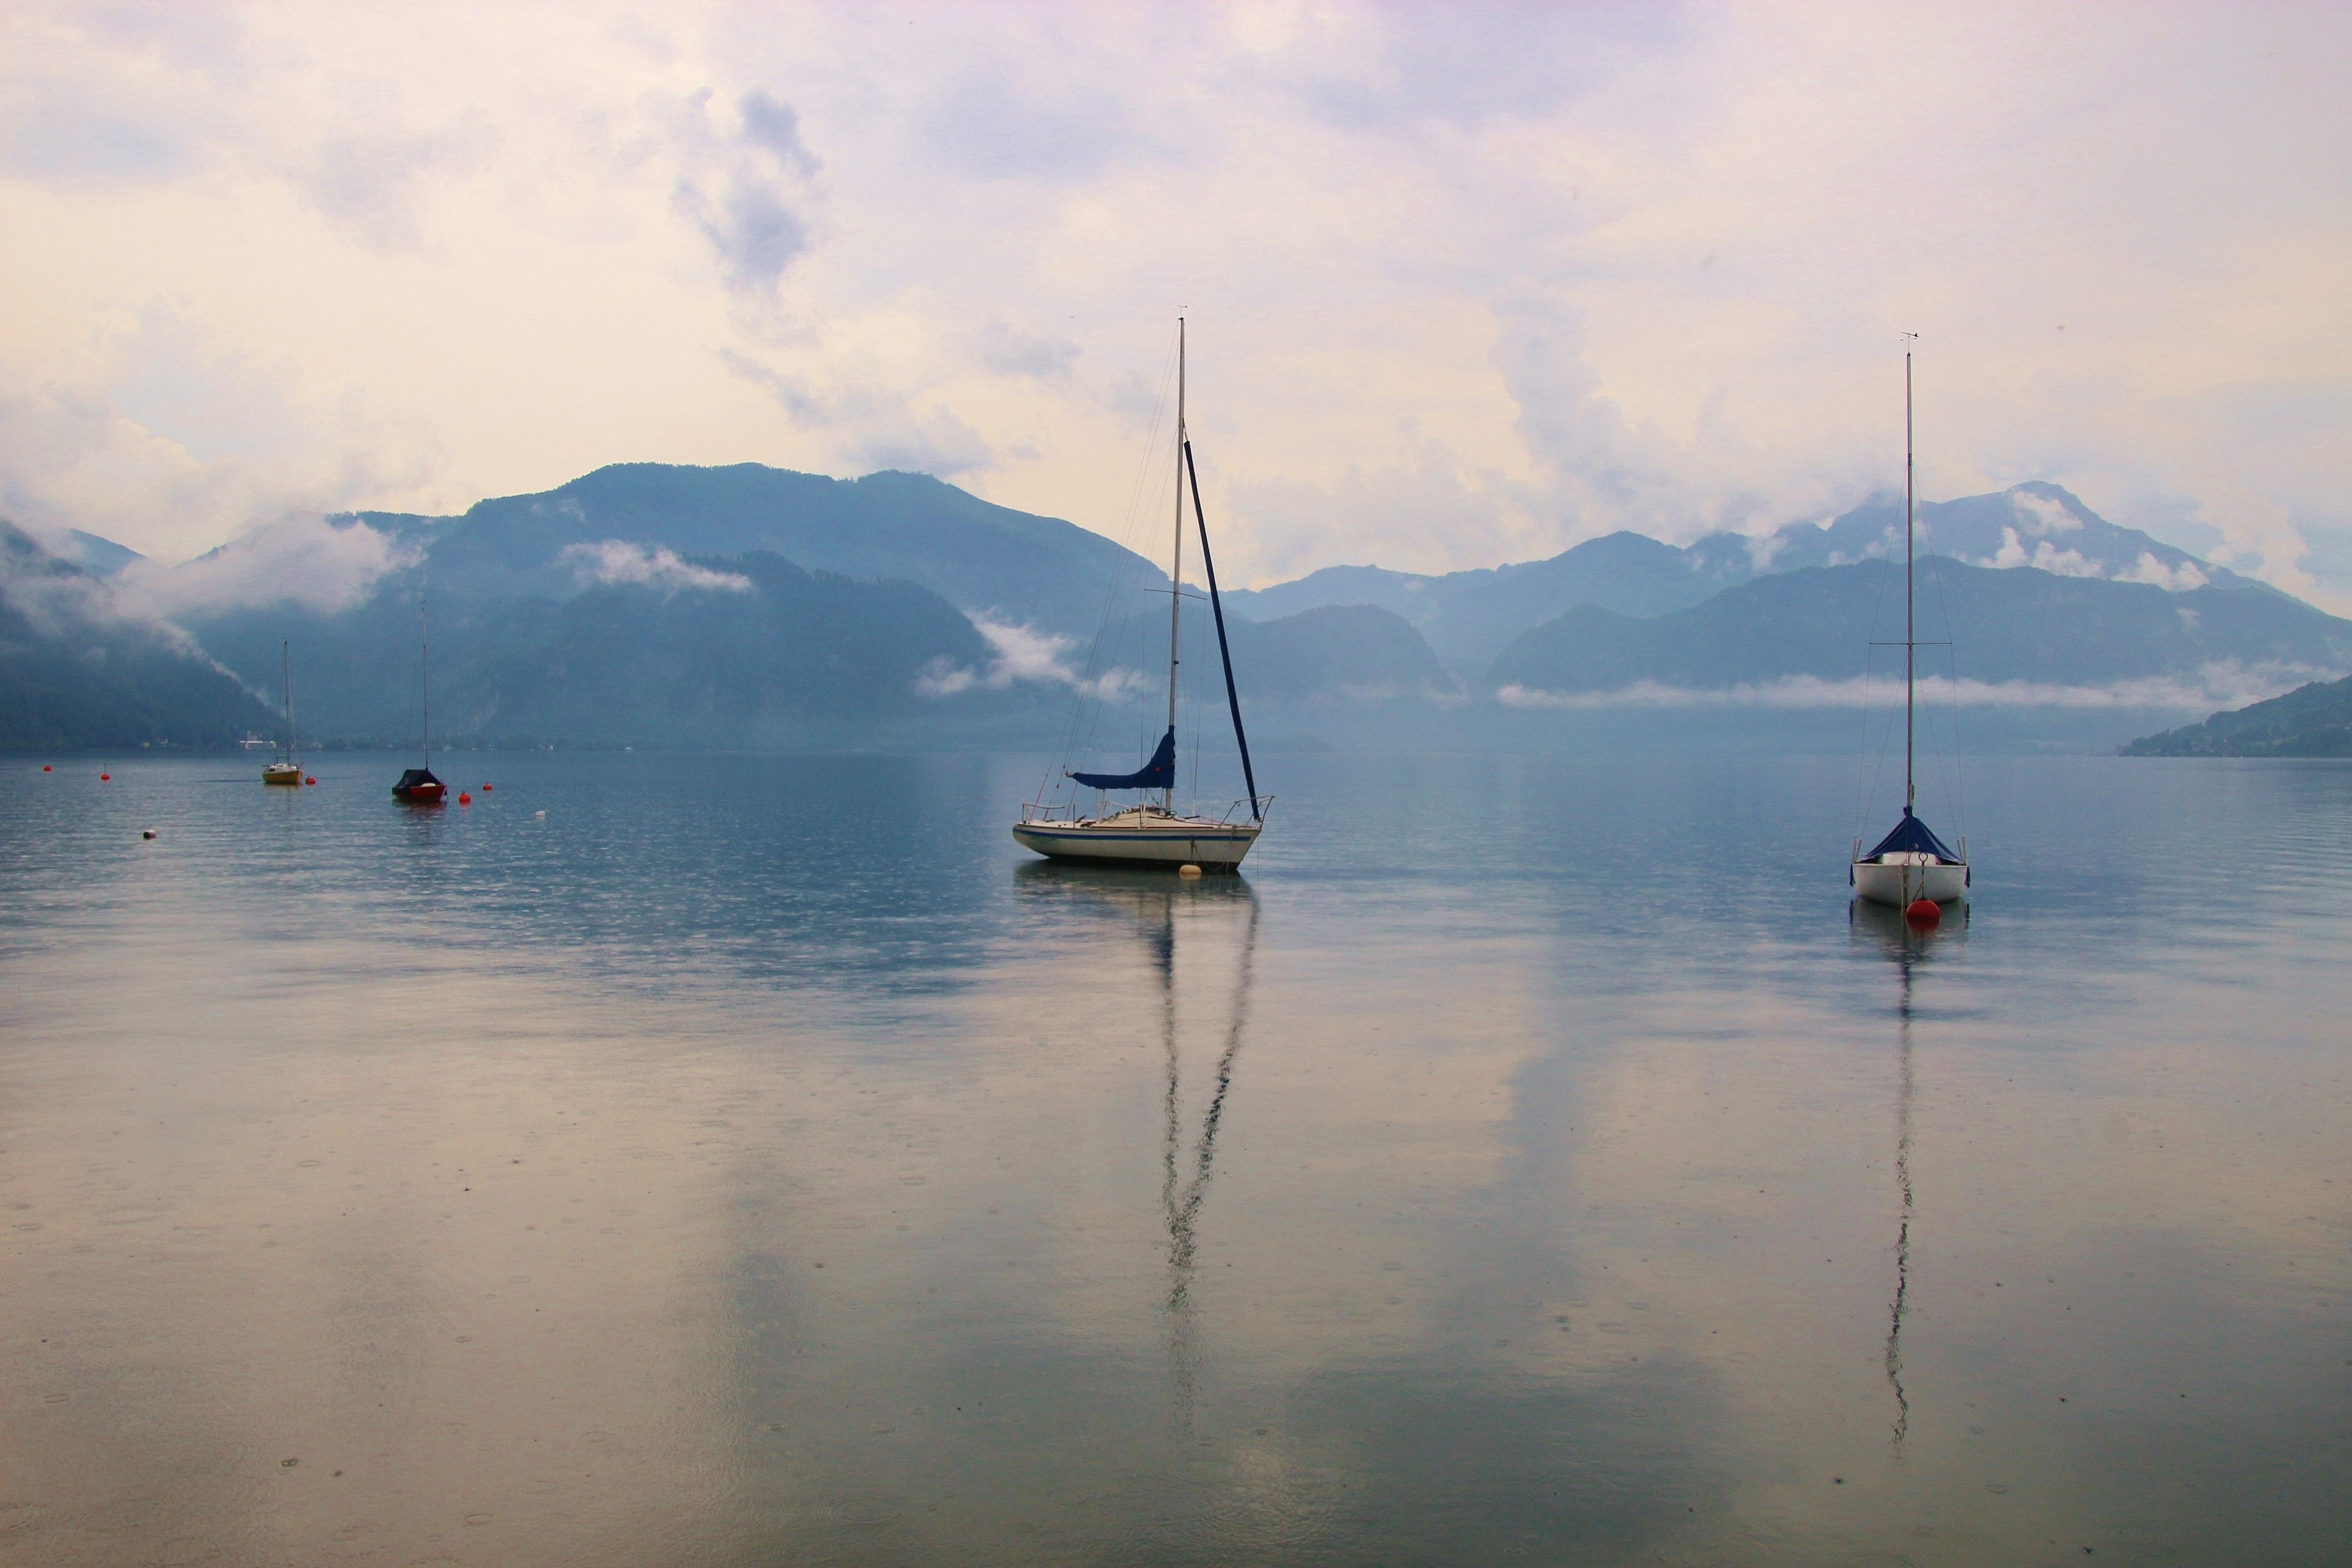 Attersee, Austria, Lake Bohinj slovenia, lake constance, switzerland, germany, austria, lake, views stays europe vacation lindau summer 2021 holiday experience localbini biniblog